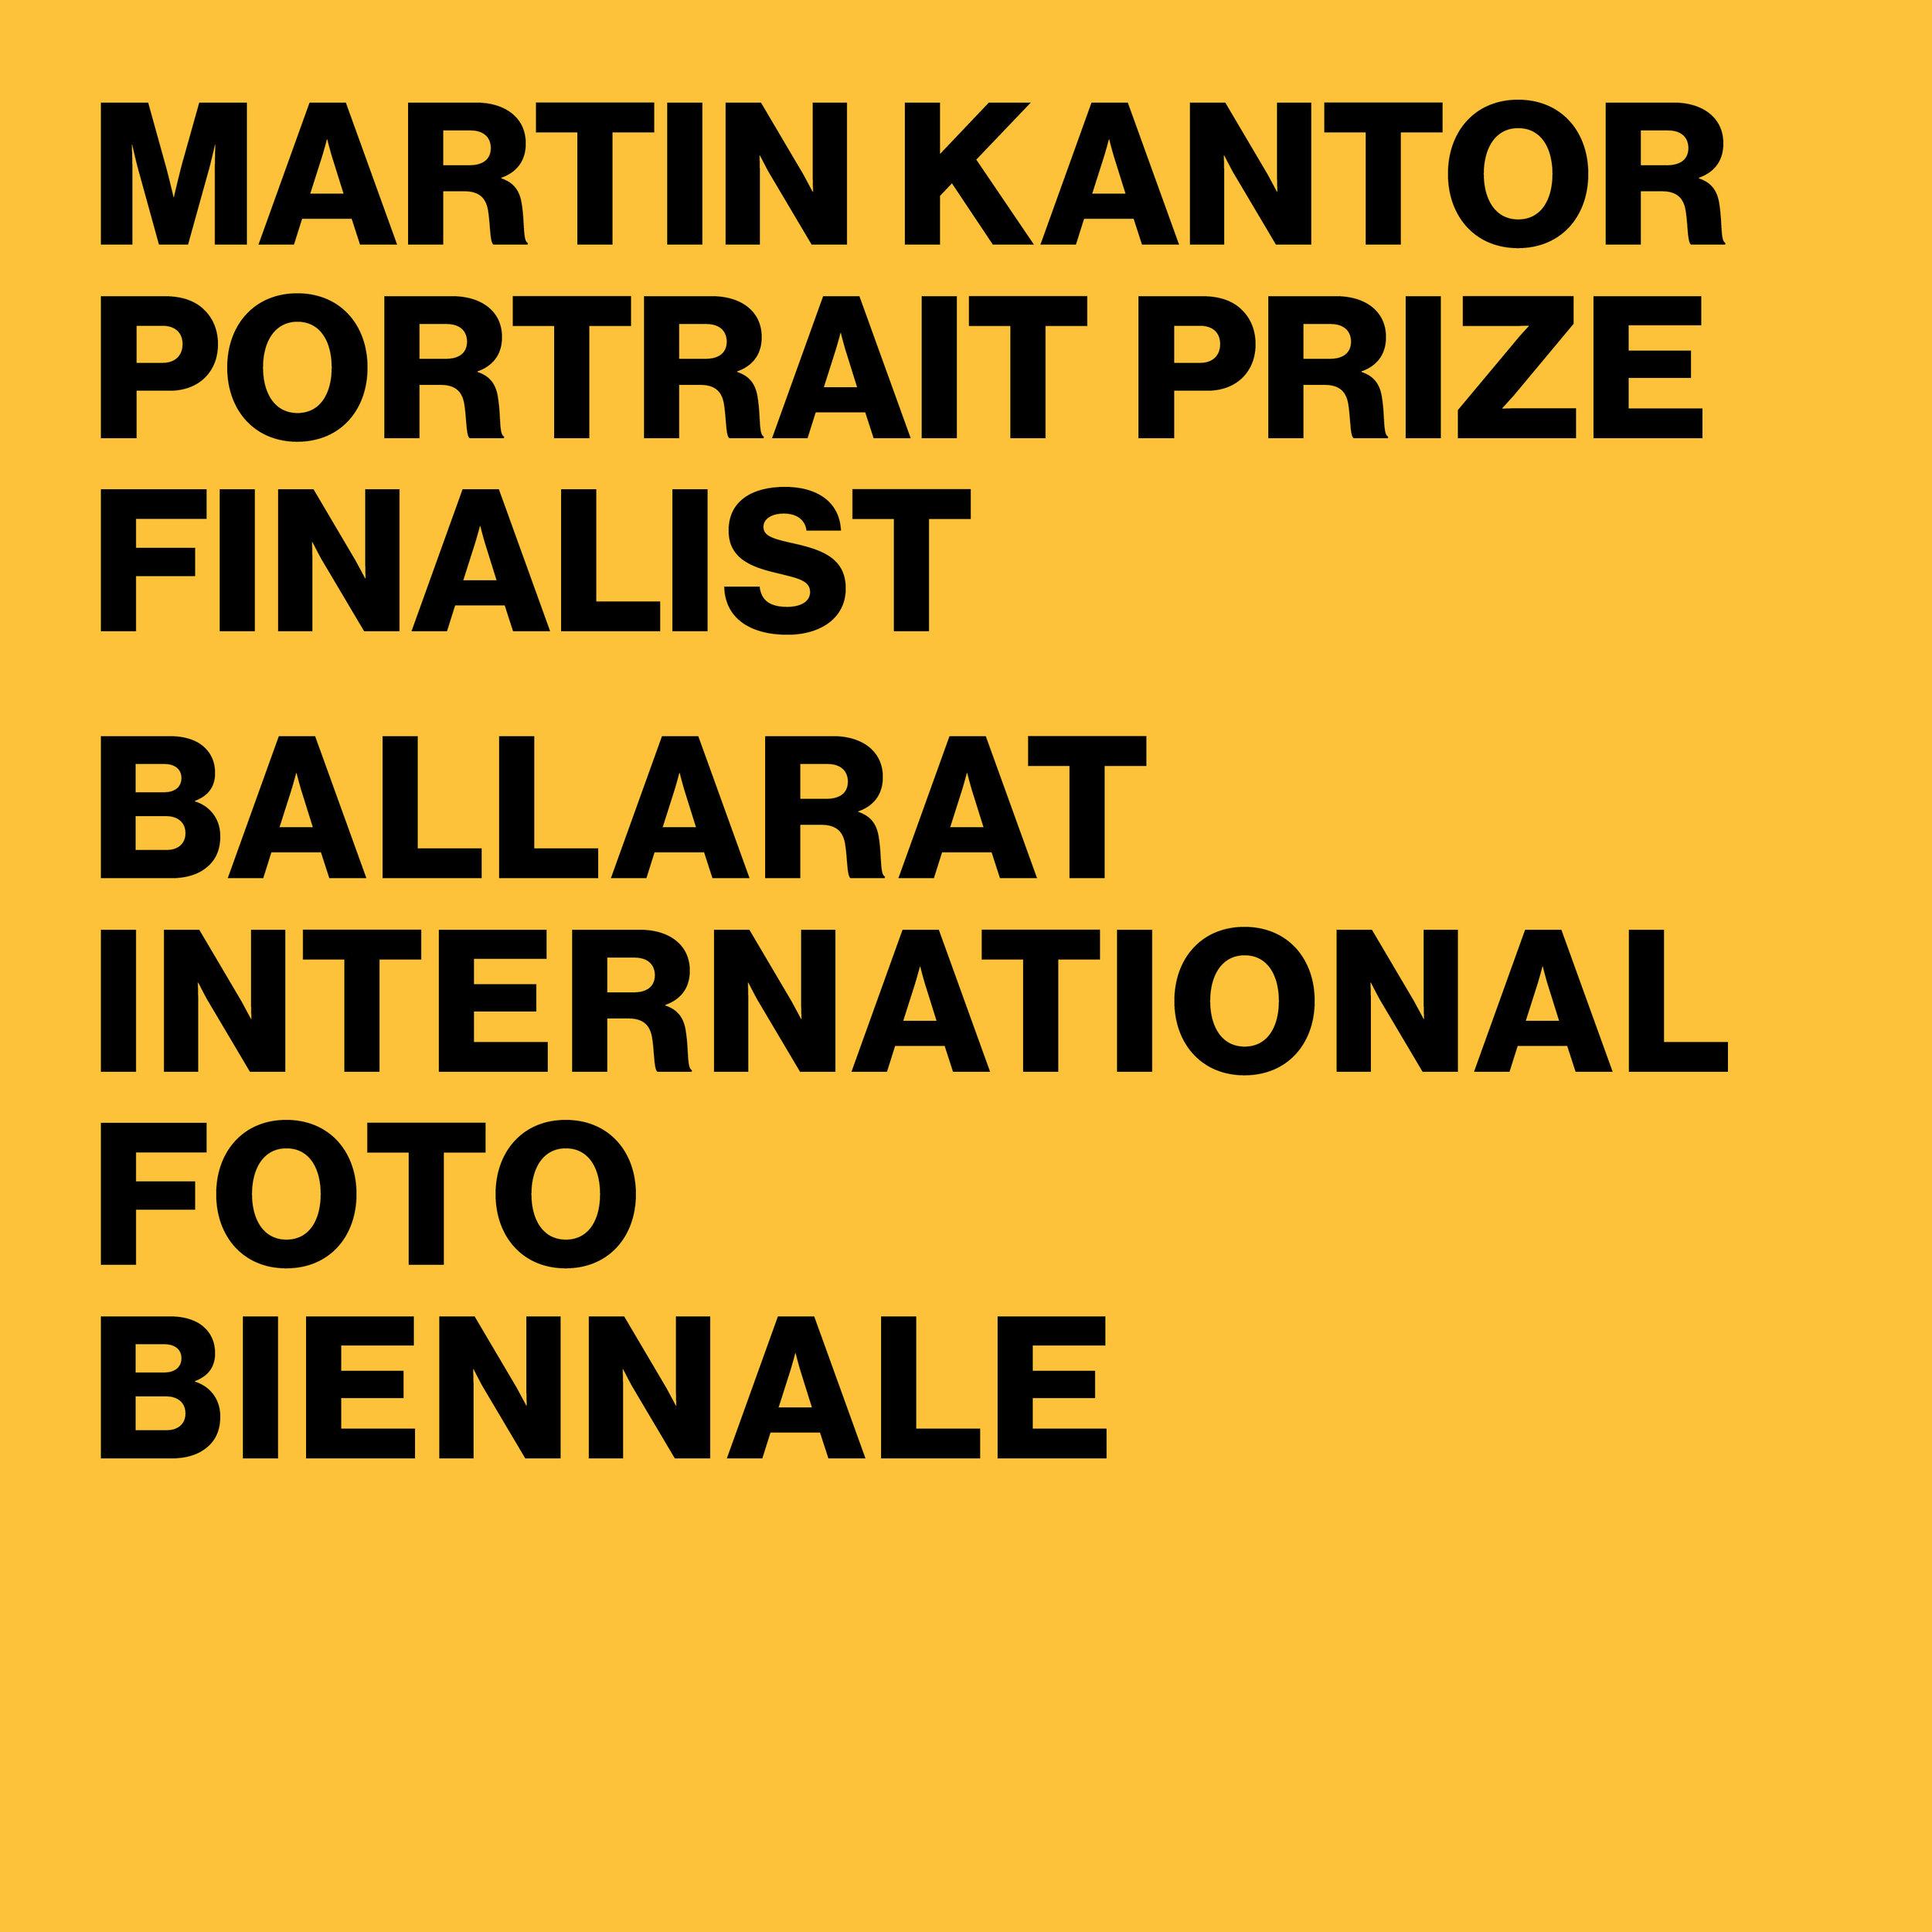 MartinKantorPortraitPrize_SocialMediaTile_Finalist.jpg